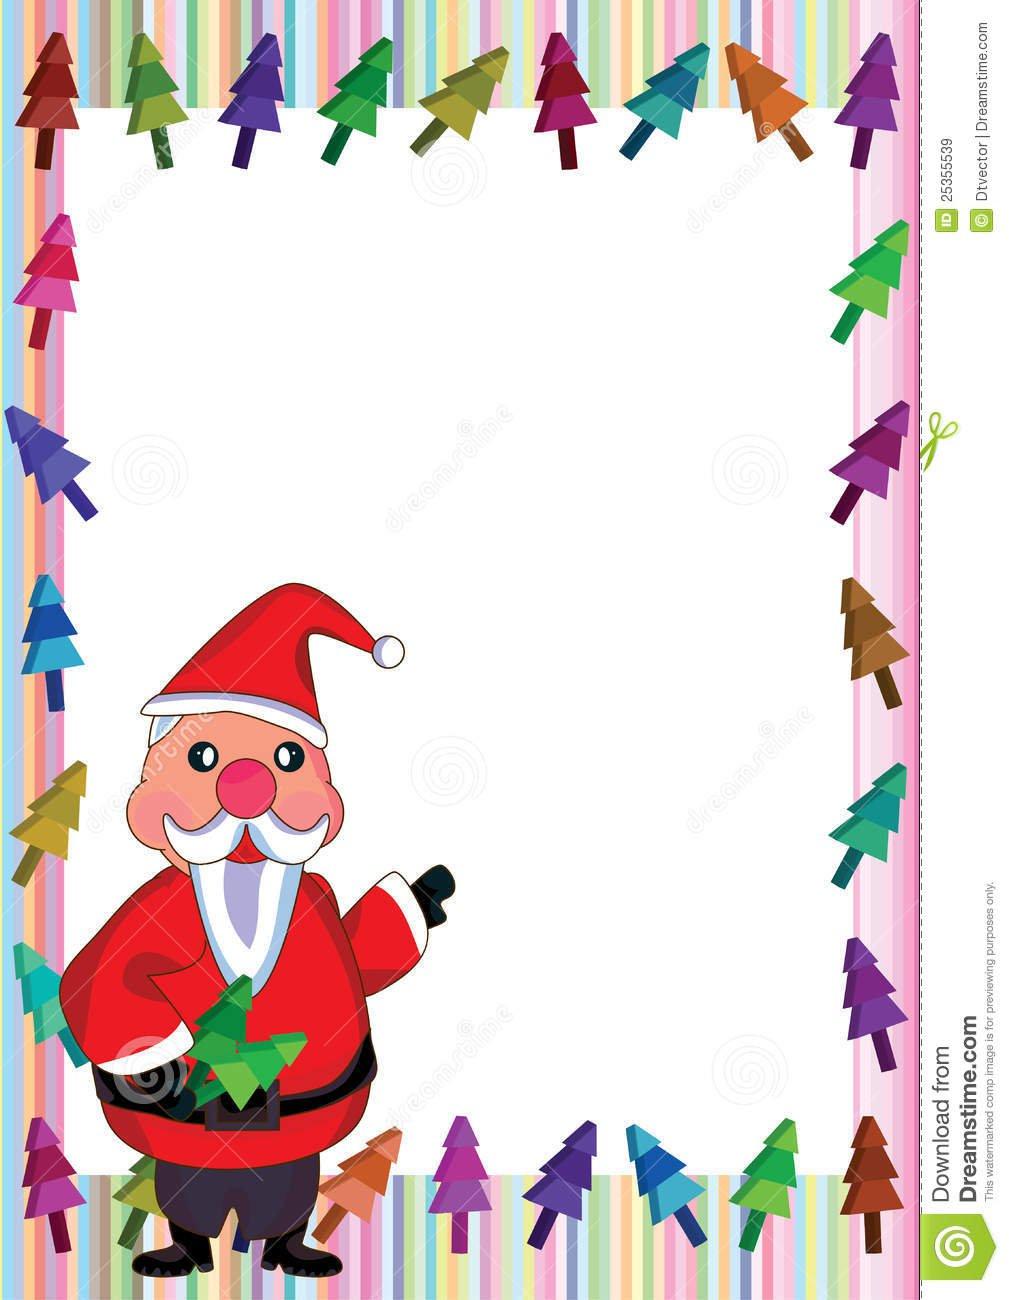 Foto De Stock  Santa Claus Colorful Tree Frame_eps  Imagem